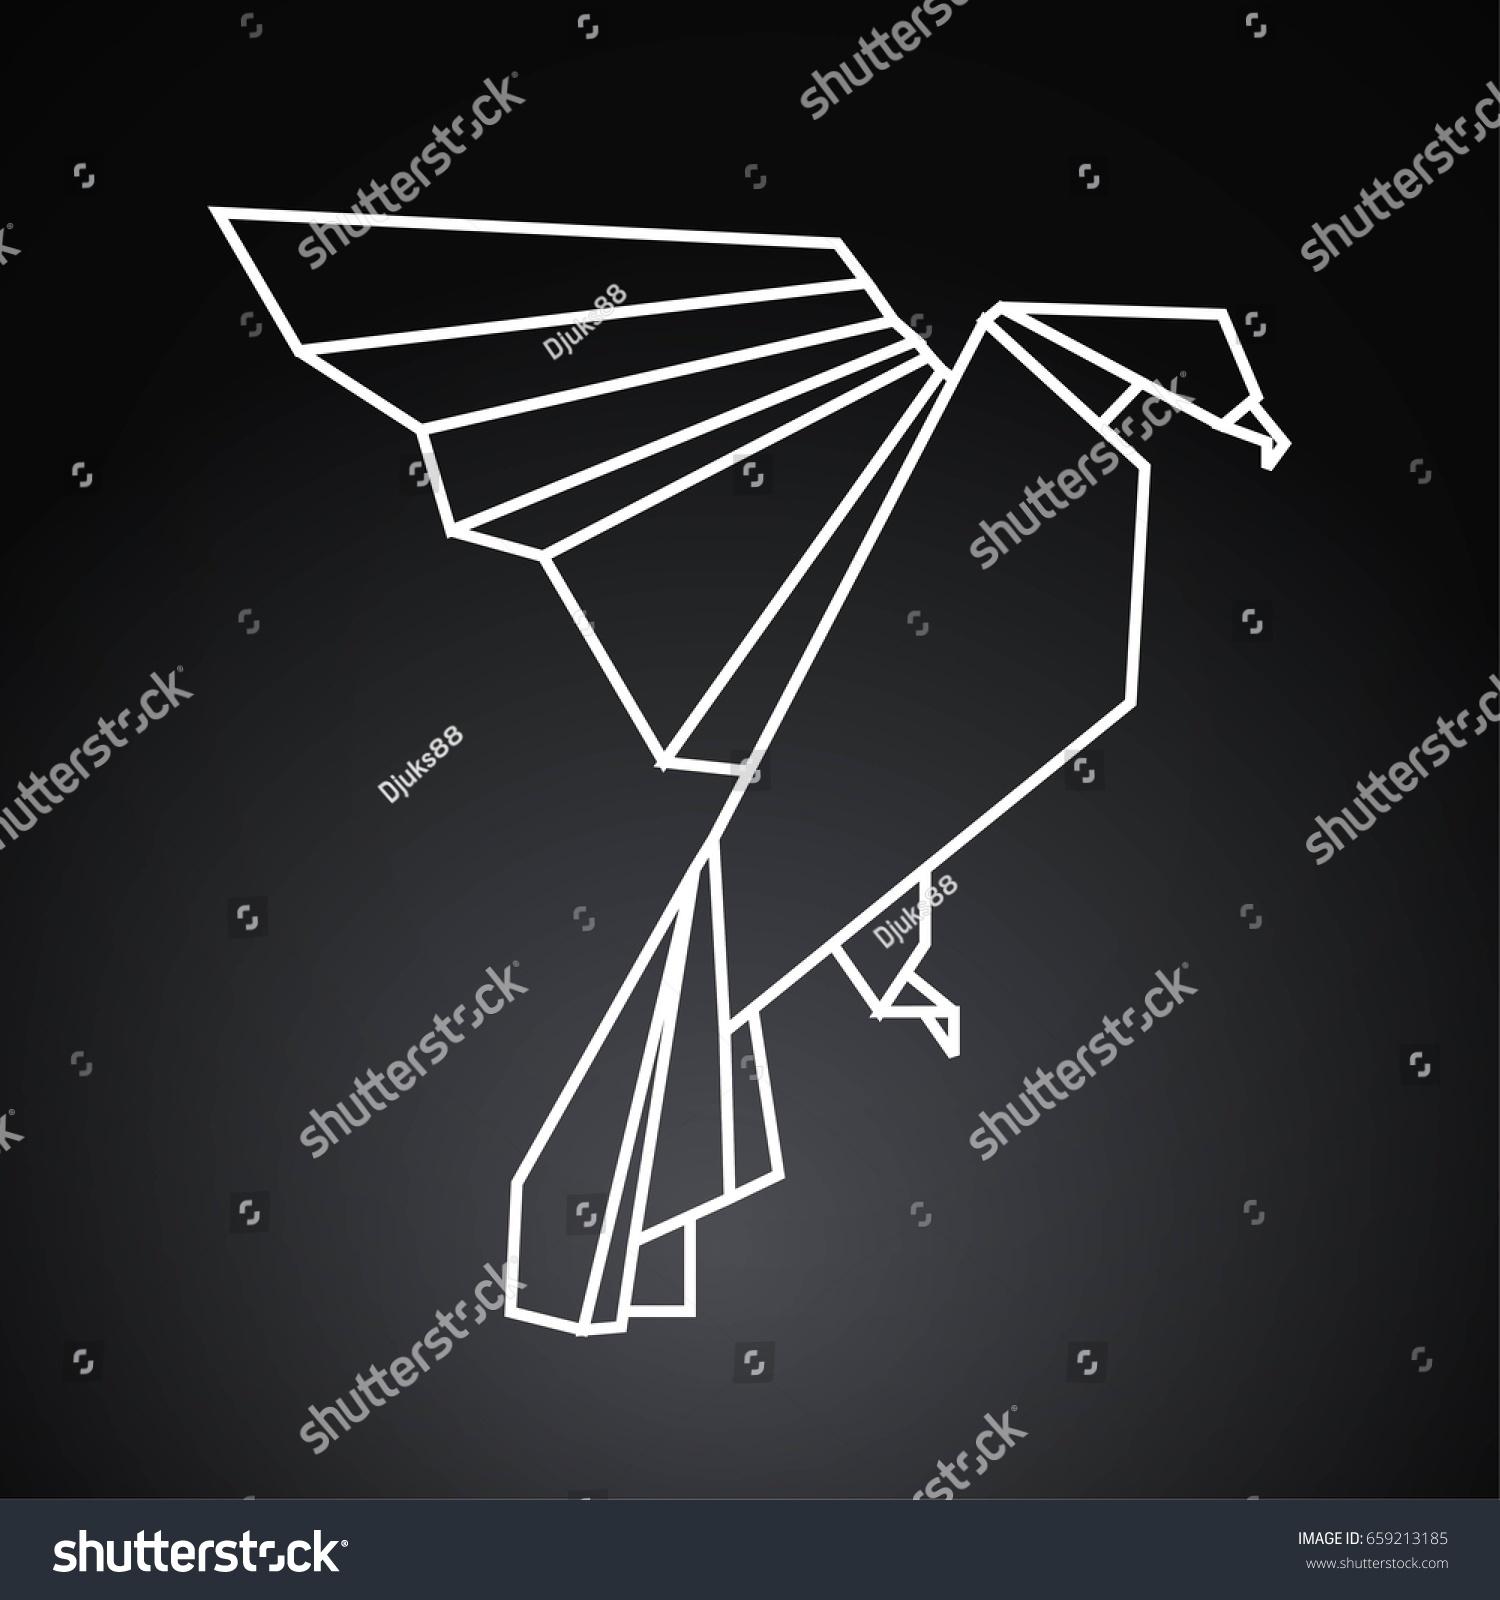 Astounding Origami Eagle Stock Illustration Royalty Free Stock Illustration Wiring Digital Resources Operbouhousnl